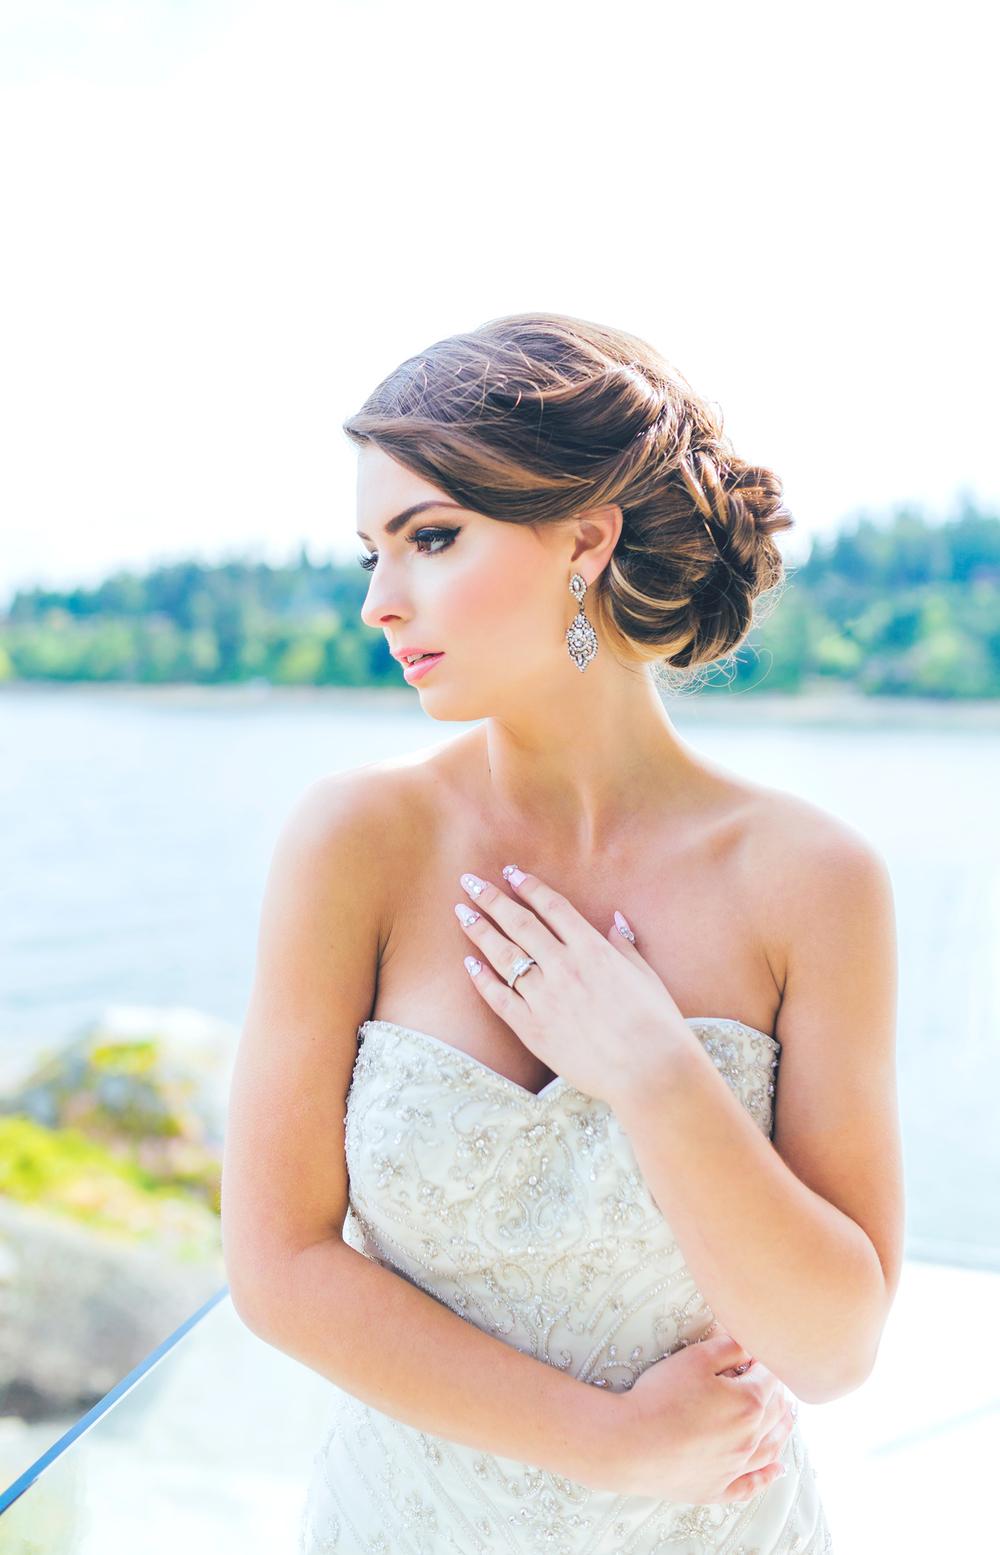 IMG_6259-BRIDAL-EDITORIAL-JENNIFER-PICARD-PHOTOGRAPHY-FINE-ART-WEDDINGS.jpg